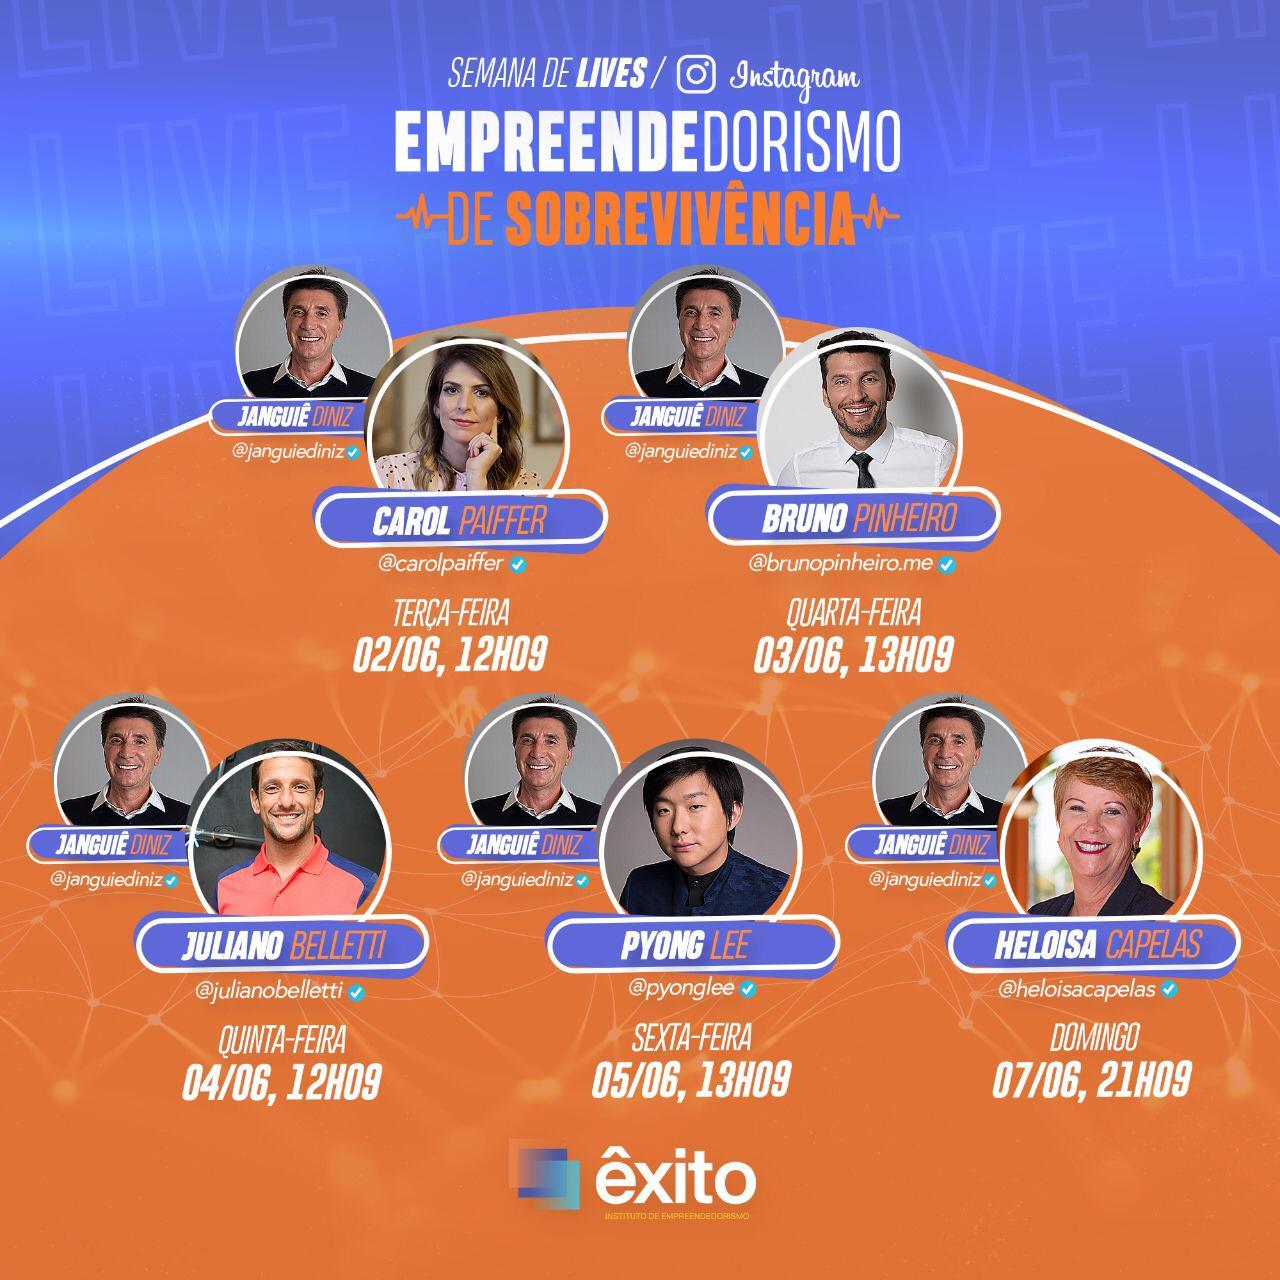 Empreendedorismo de Sobrevivencia - Instituto Exito de Empreendedorismo